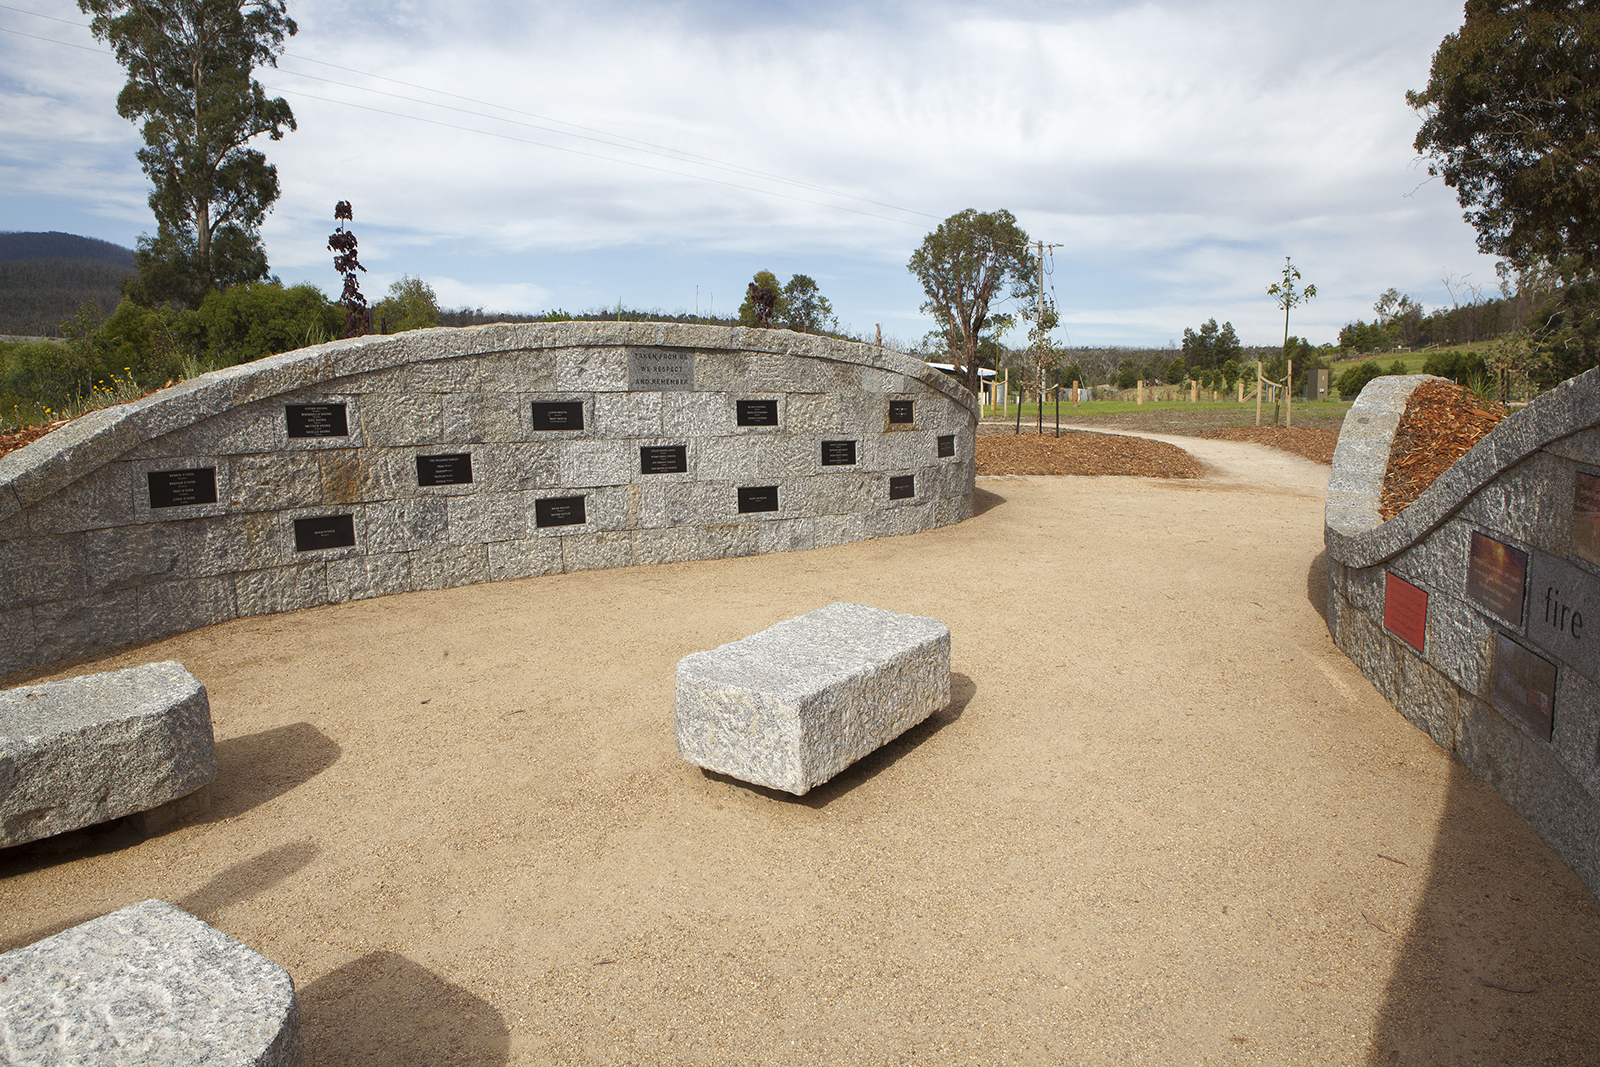 Whittlesea Bushfire Memorial, Australia